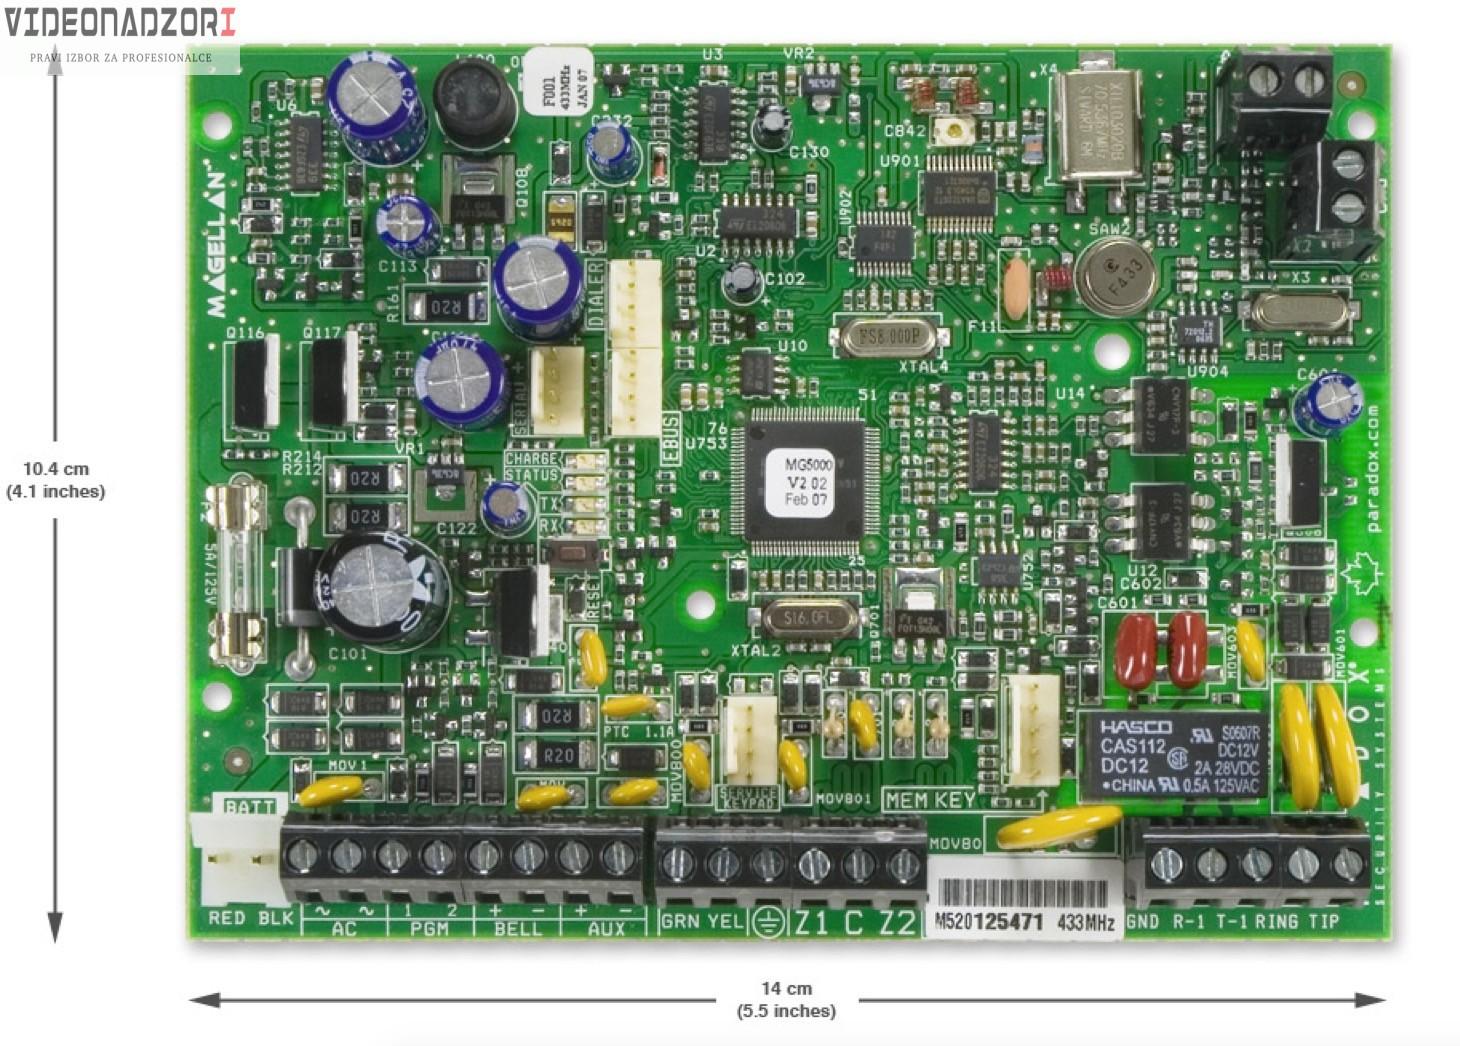 Paradox MG-5050/PCB 433 brend HikVision Hrvatska [ za 1.312,50kn